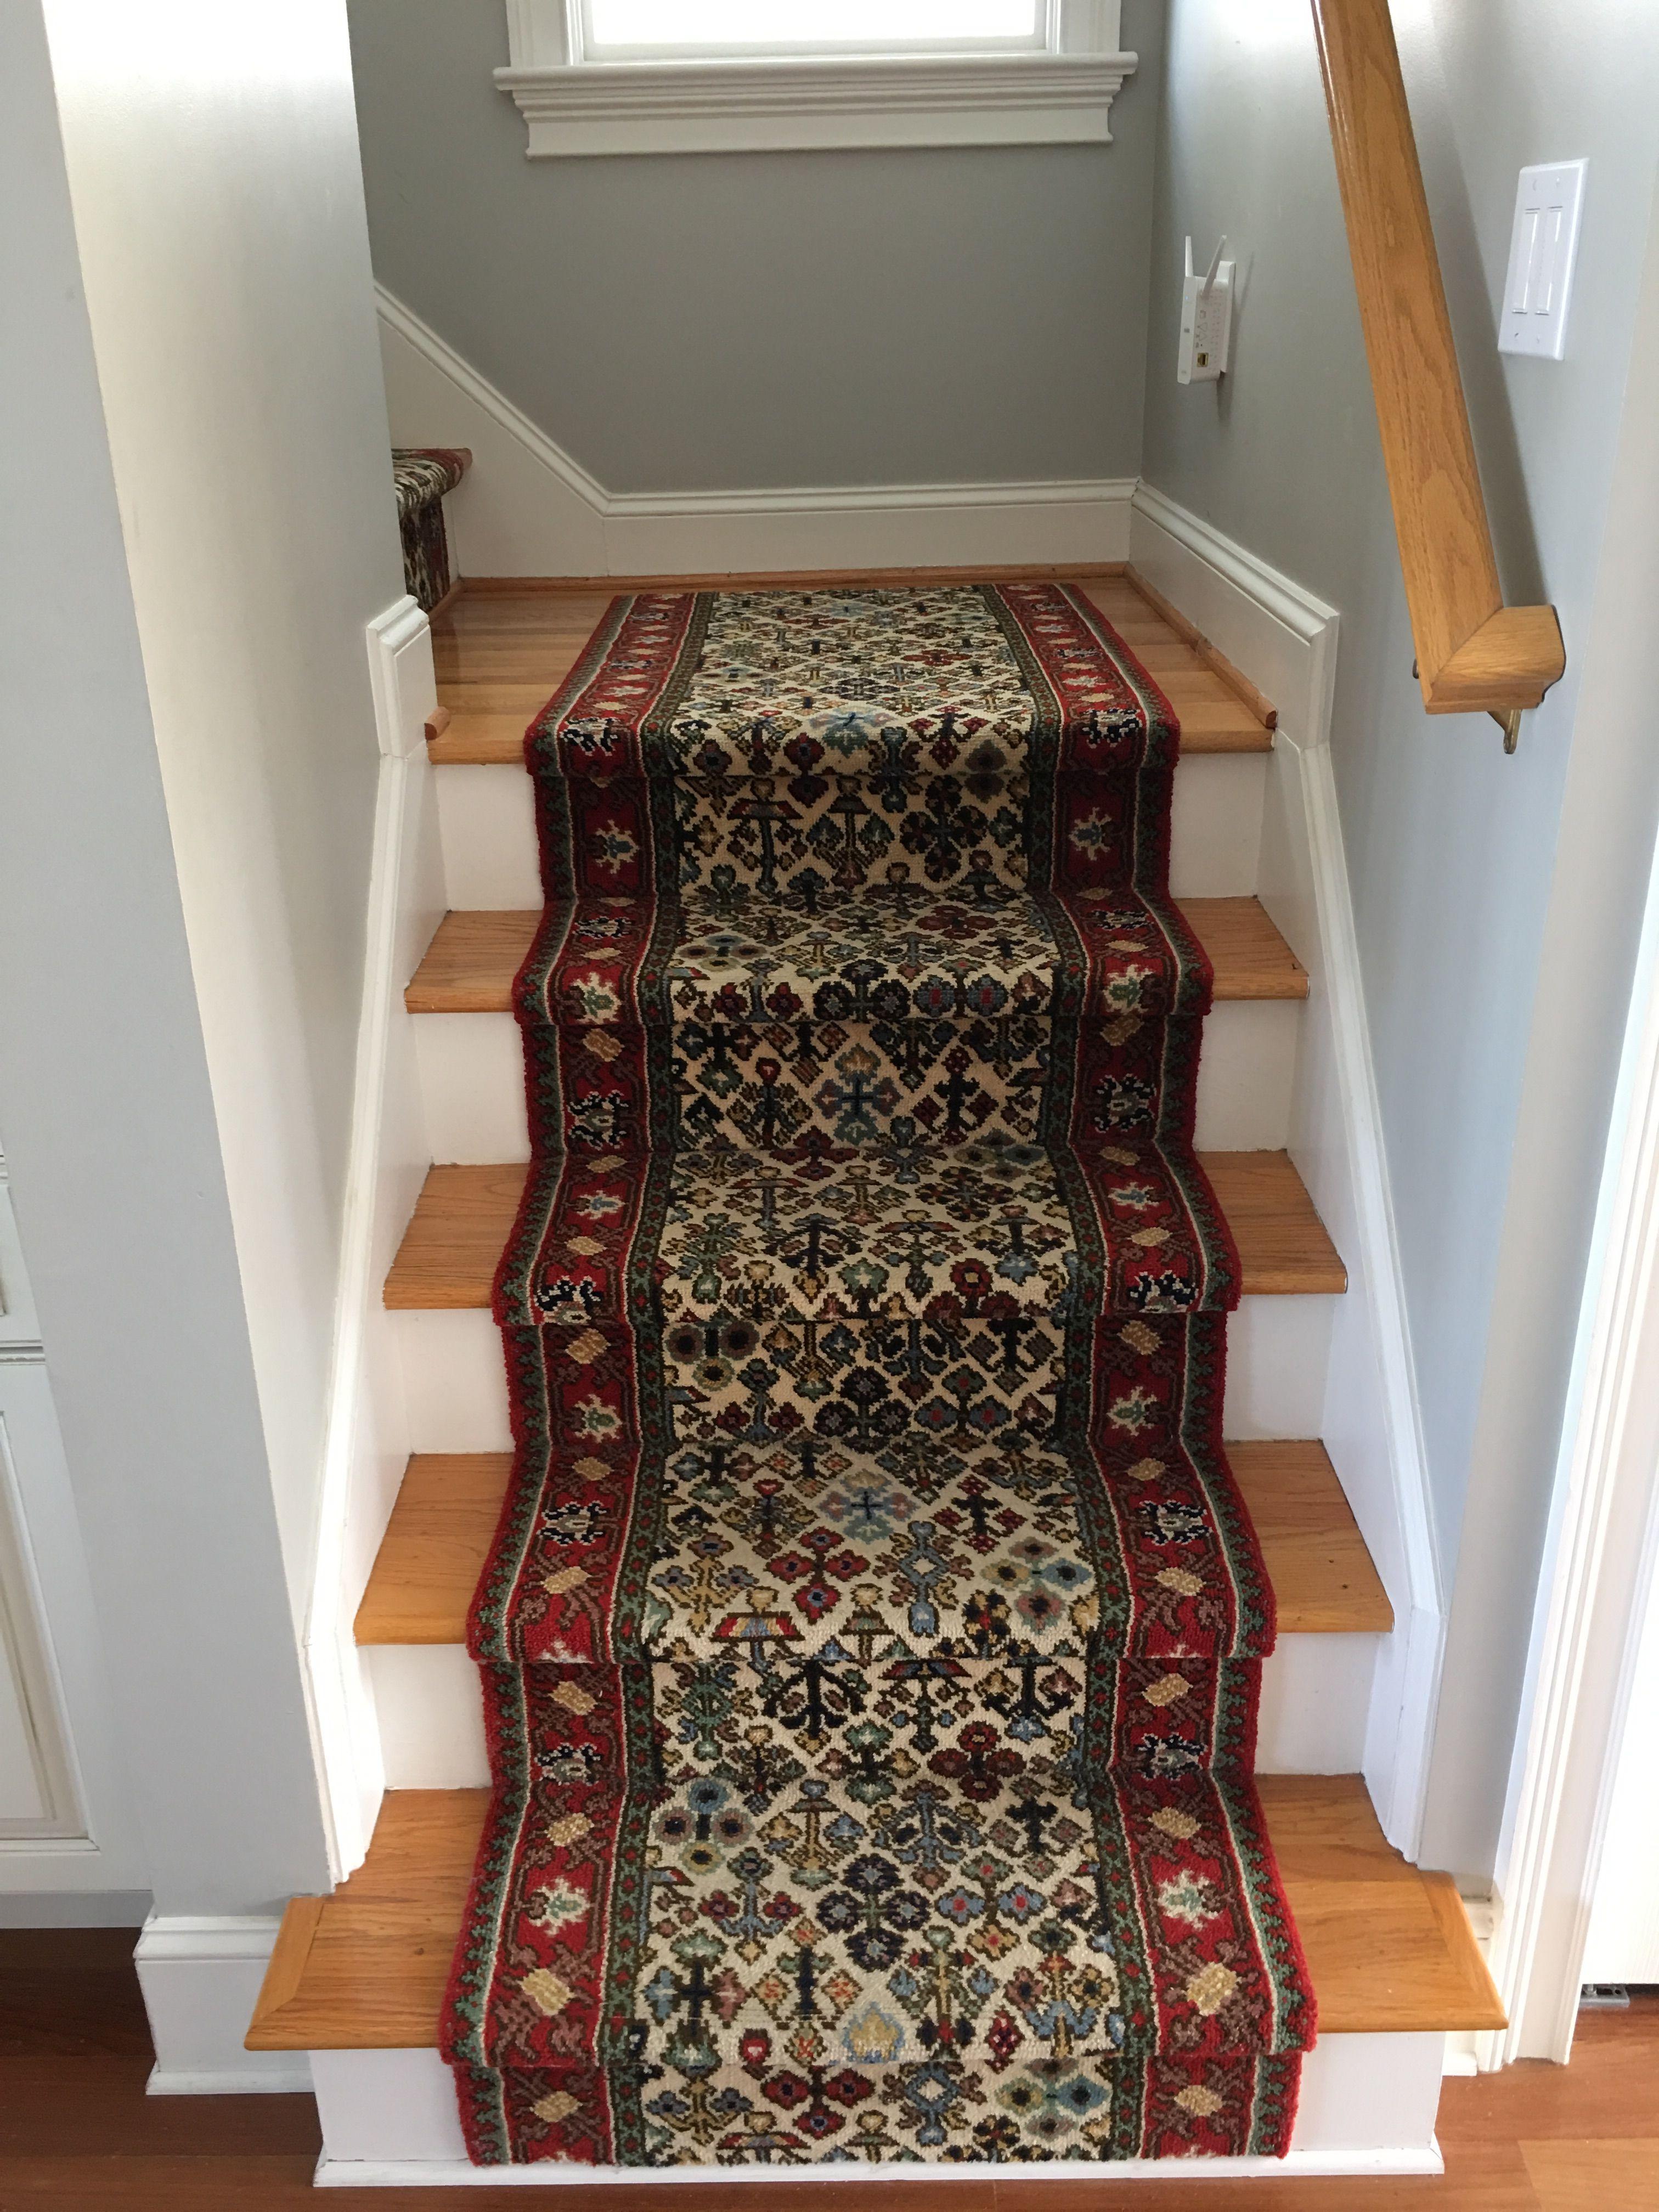 Best Existing Stair Carpet Runner In 2020 640 x 480